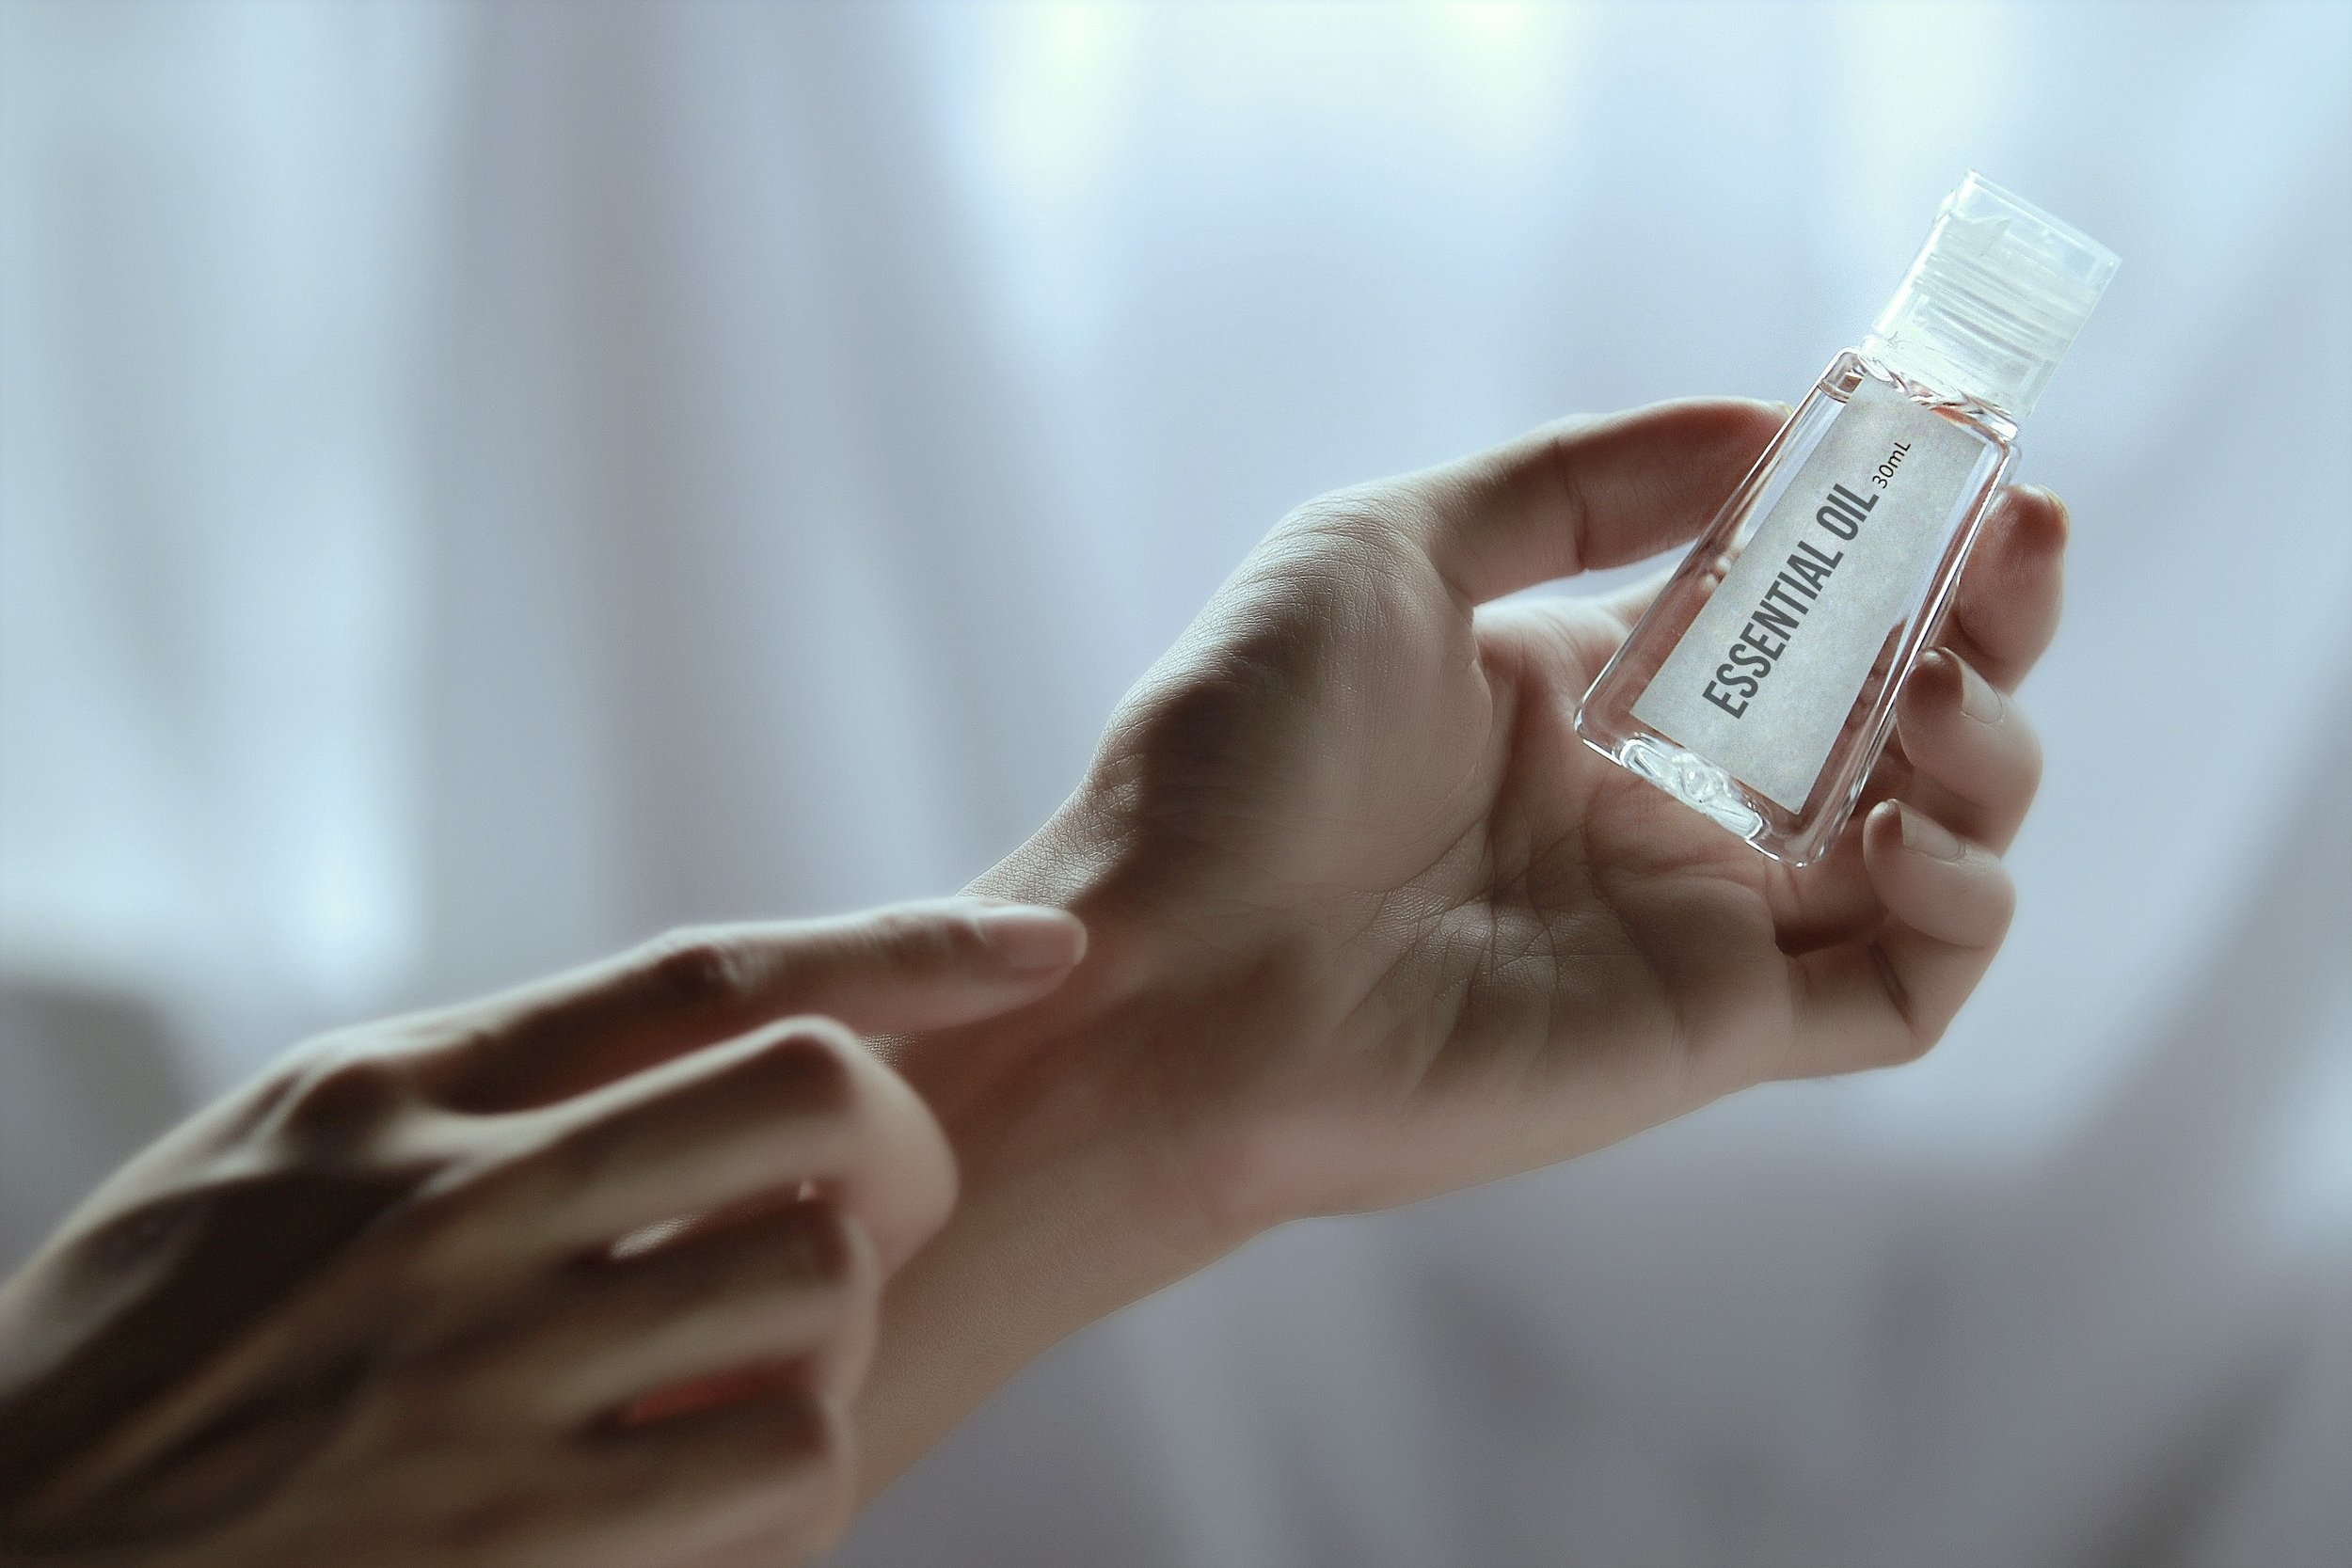 aromatherapy-beauty-blur-260405.jpg